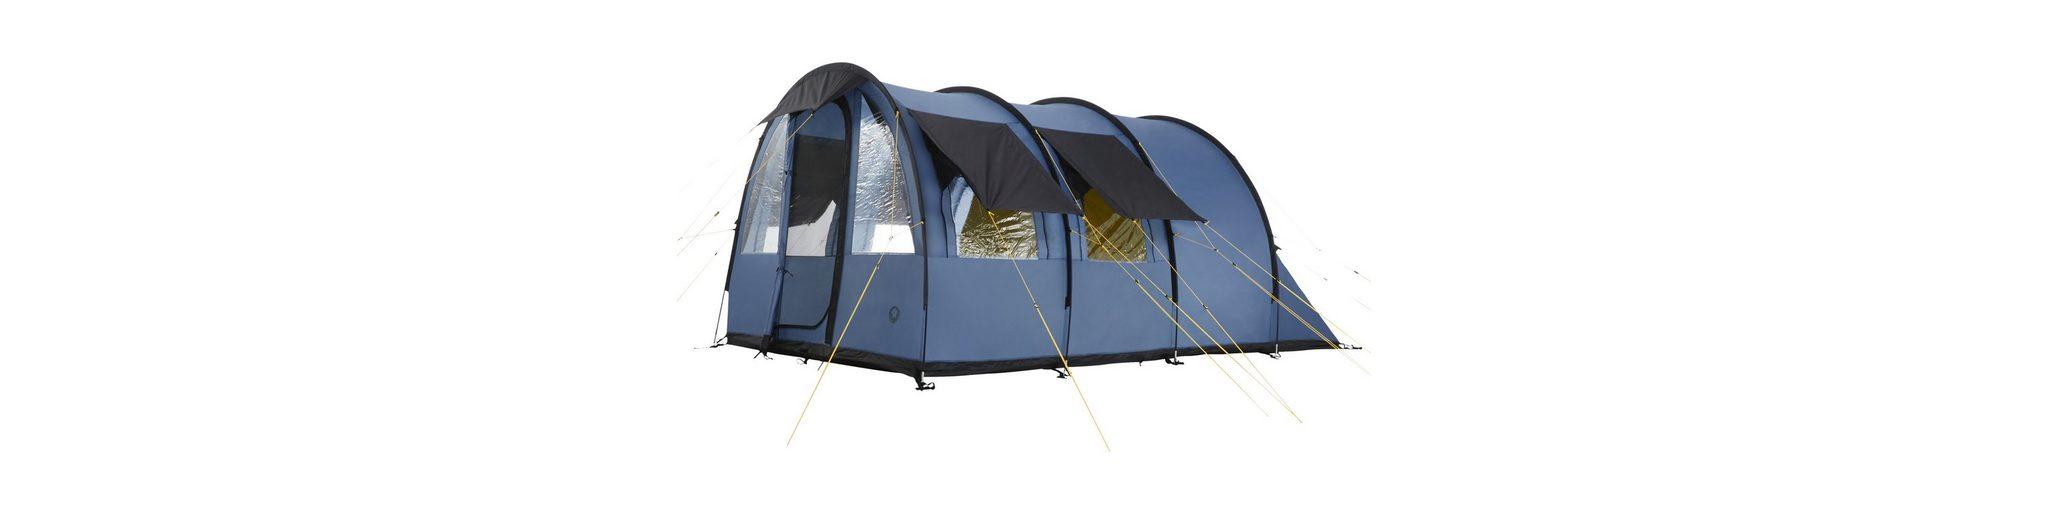 Grand Canyon Zelt »Helena 3 Tent«